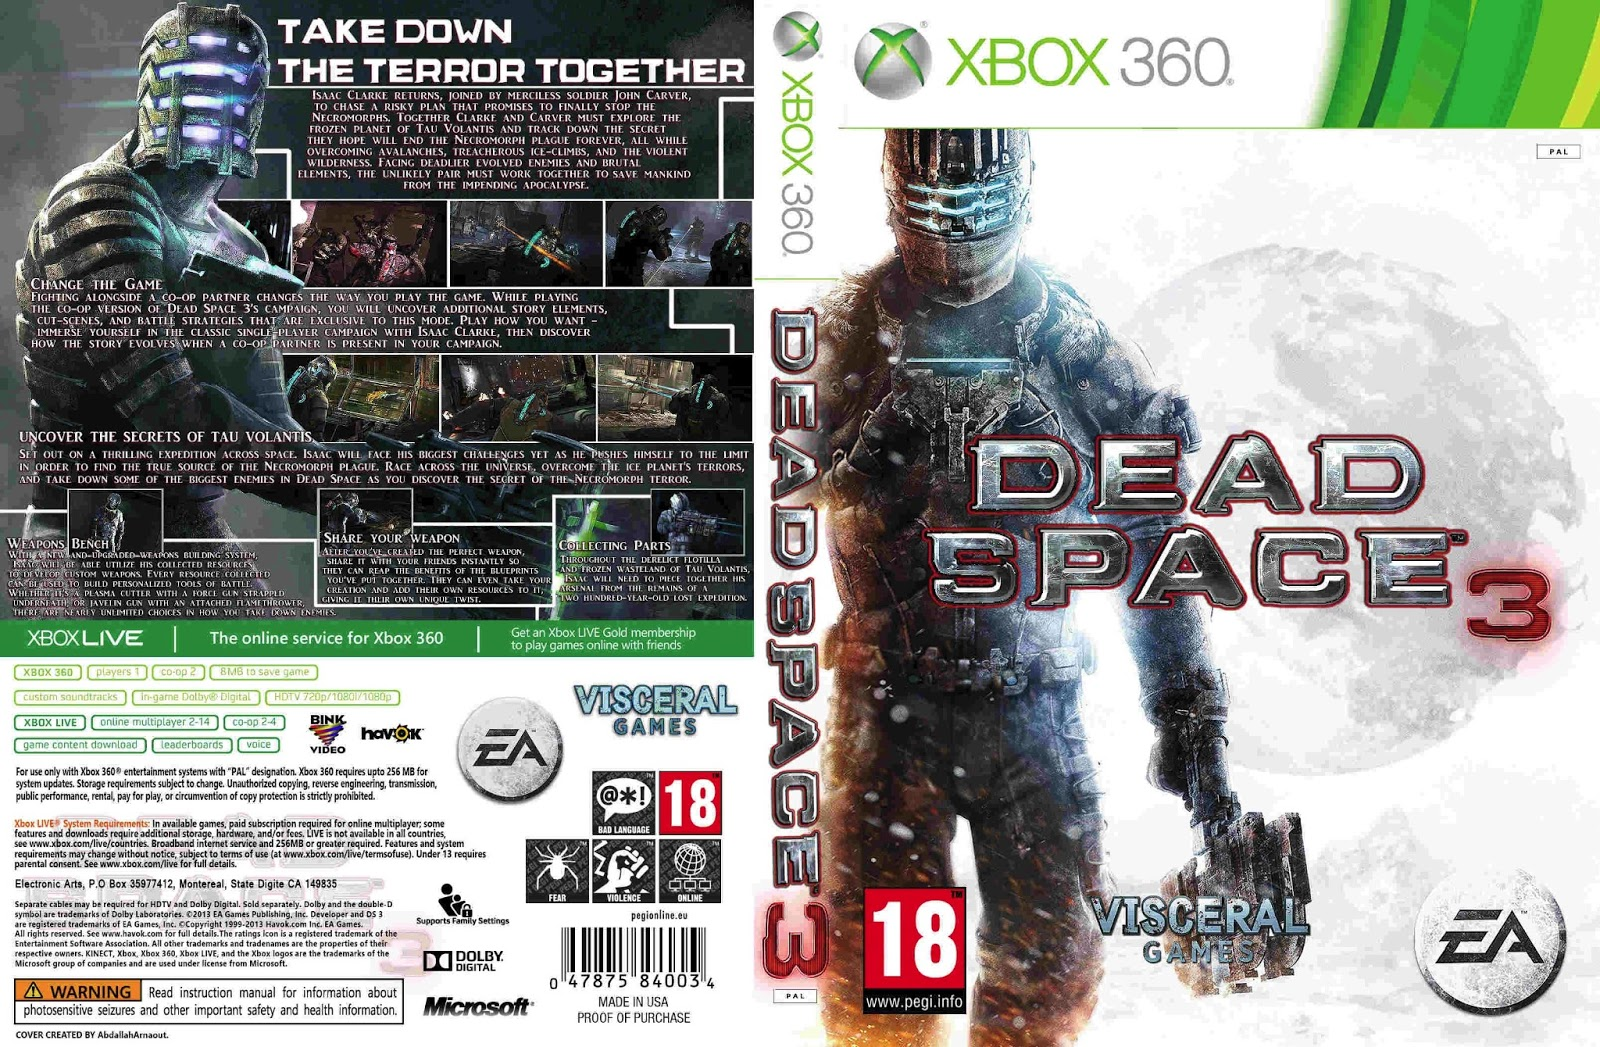 HARD GAMESS: DEAD SPACE 3 DEMO   XBOX 360